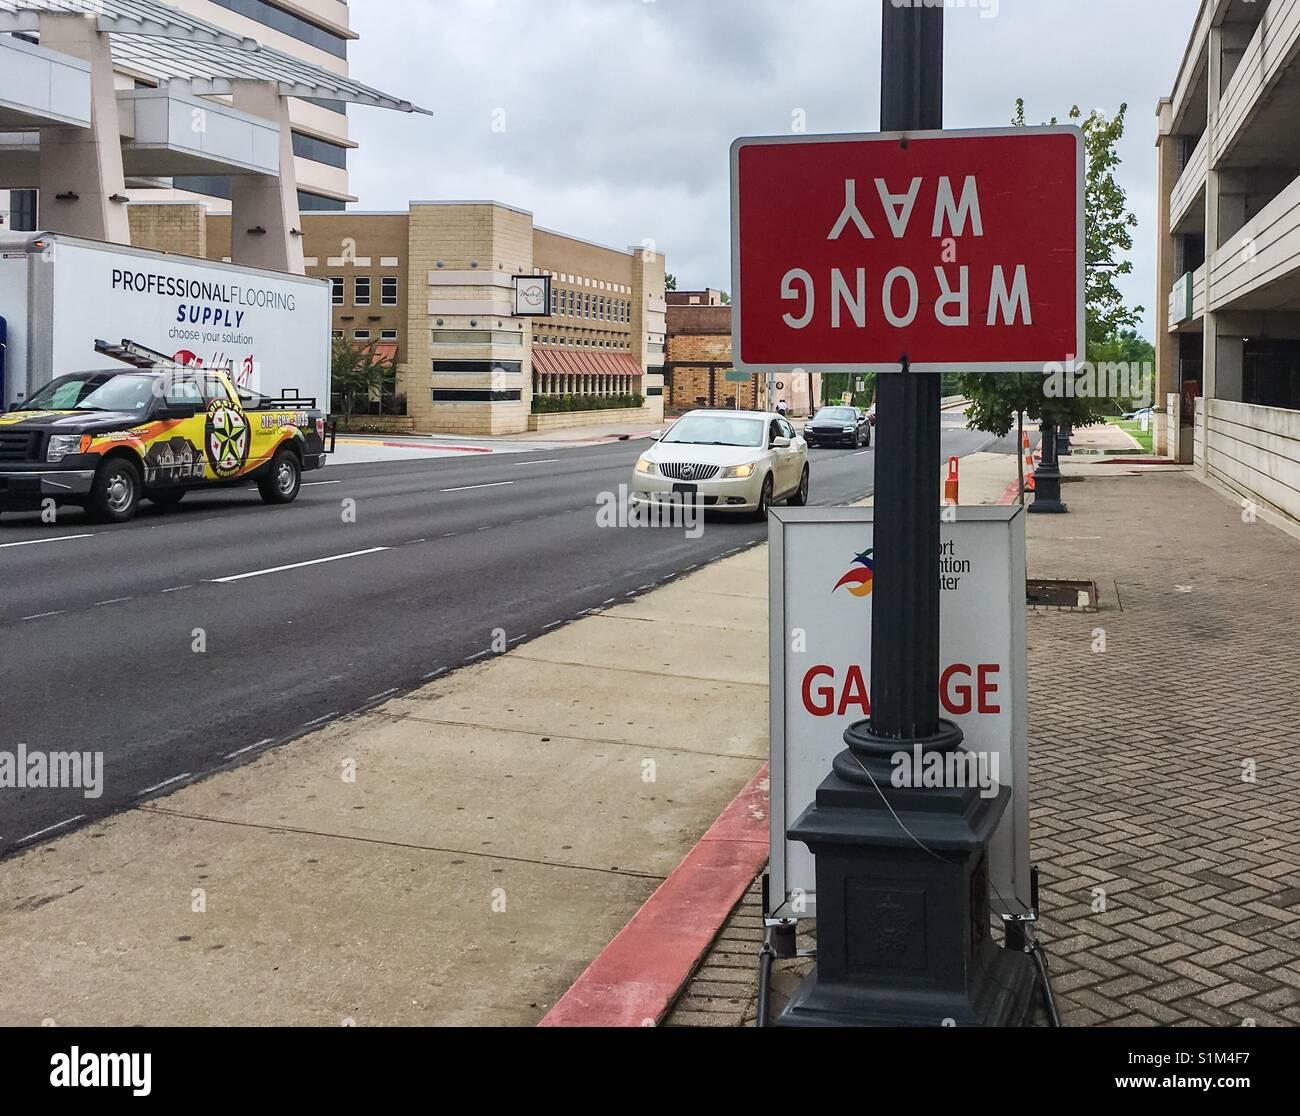 Upside down wrong way sign. - Stock Image